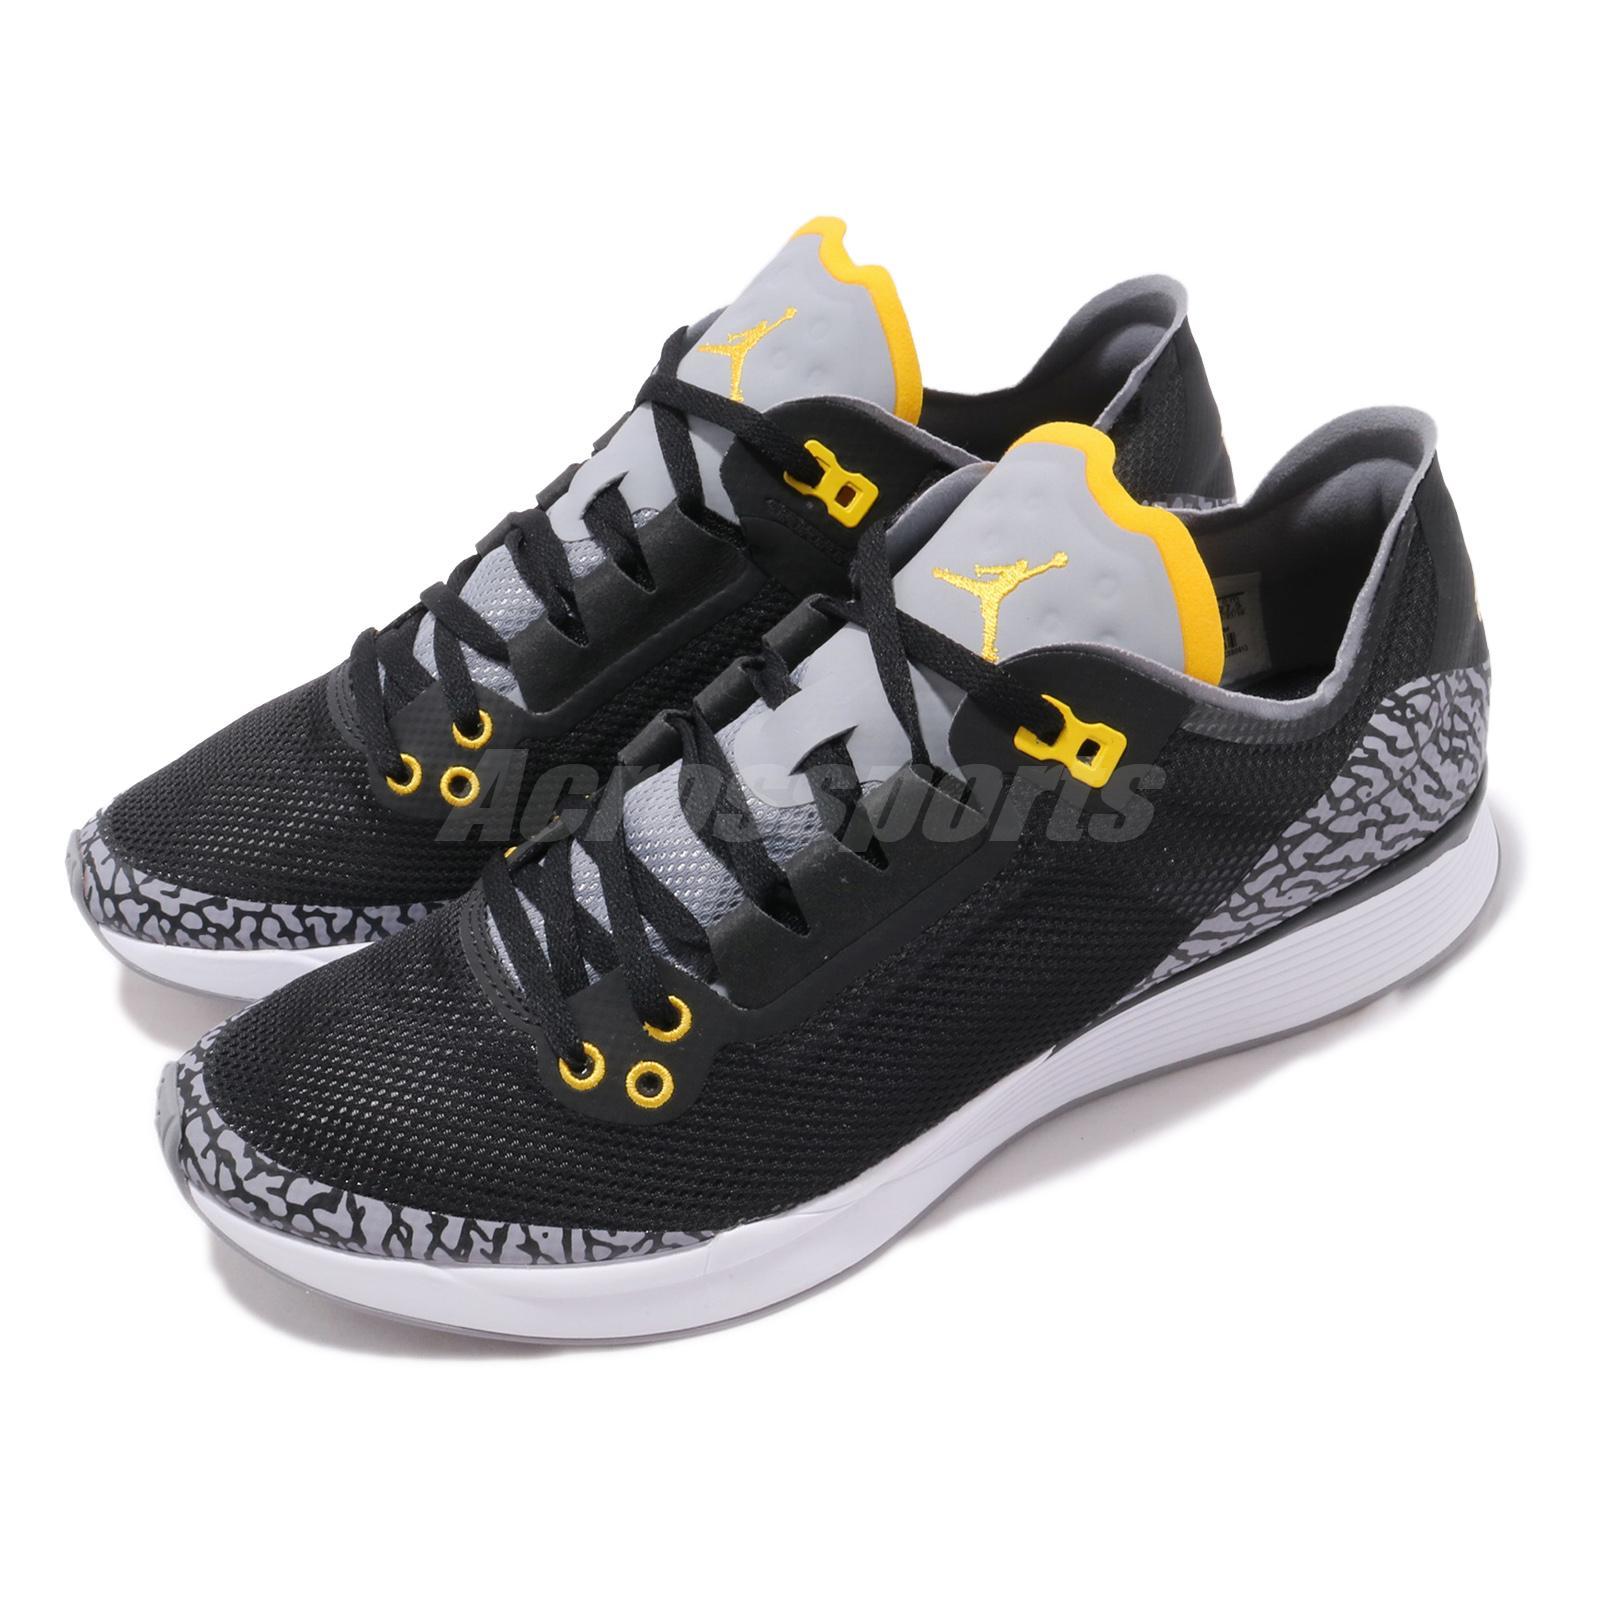 Nike Jordan 88 Racer College Navy